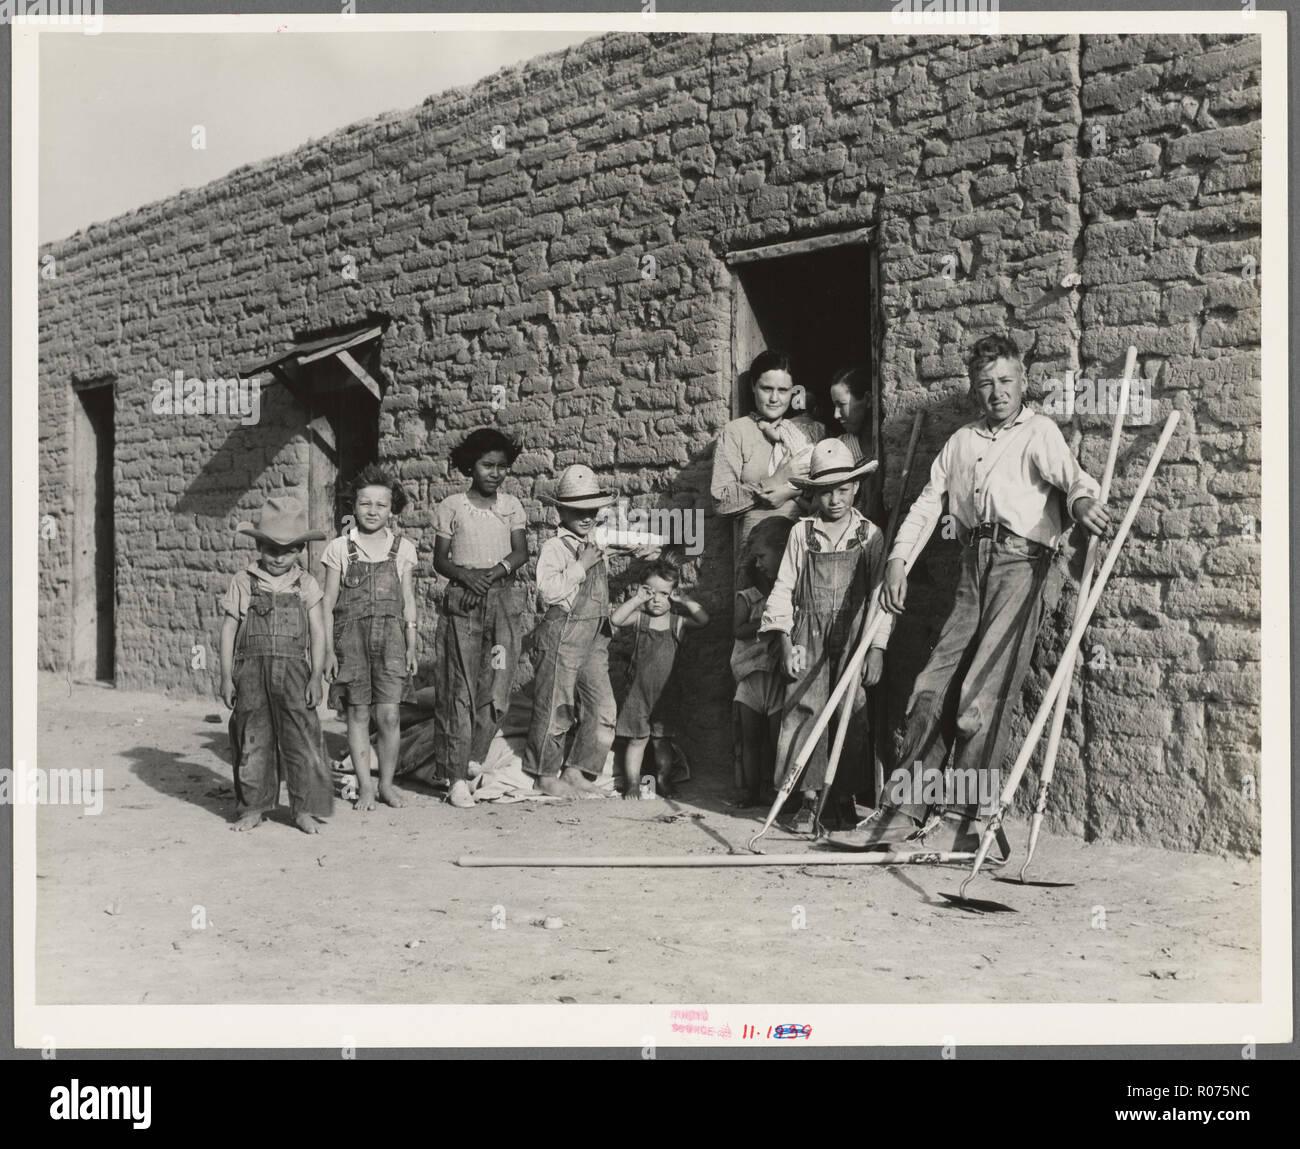 vintage great american depression era photo - Stock Image